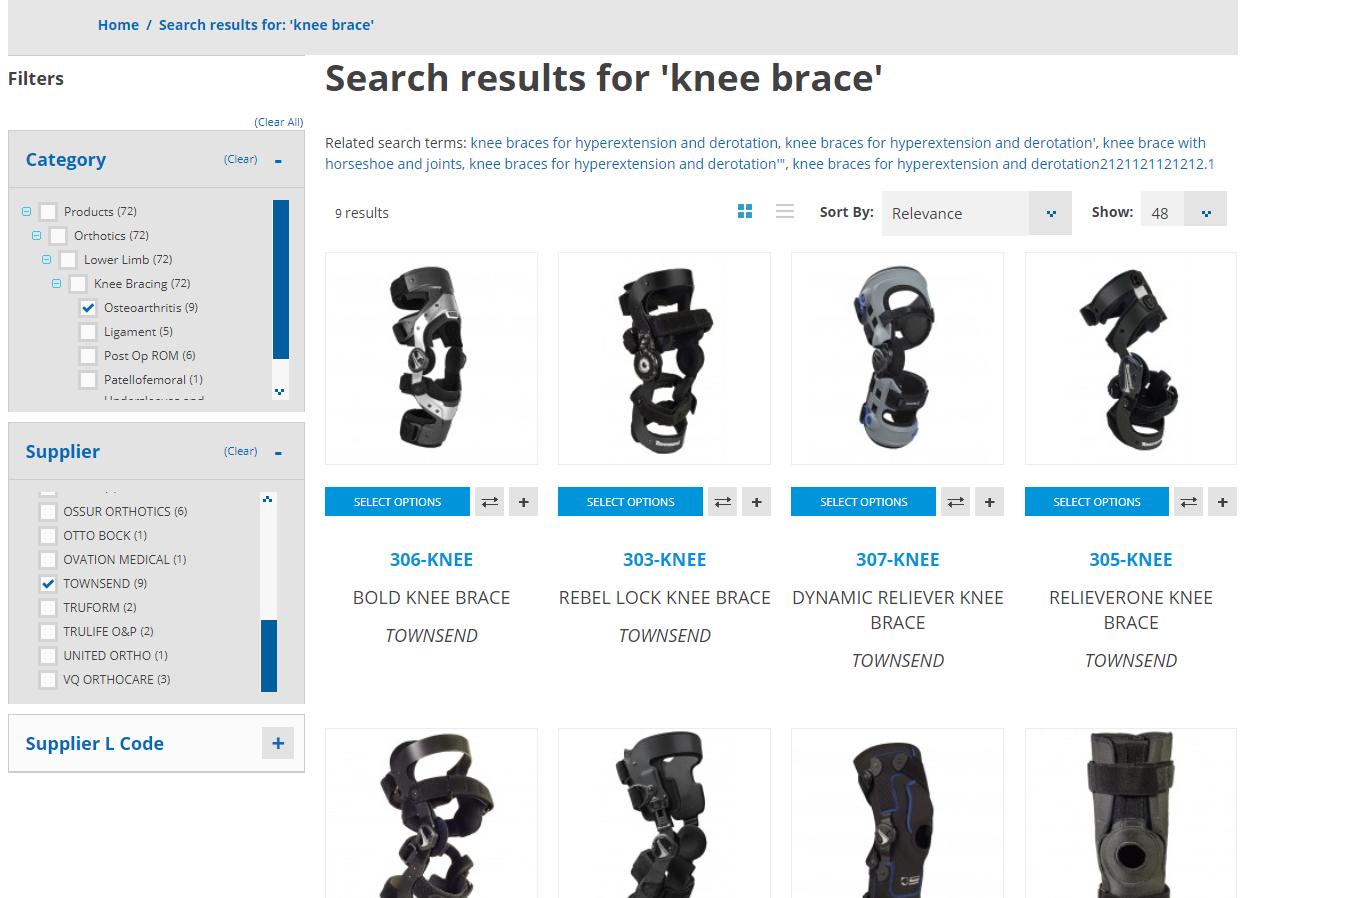 knee brace filter by supplier - townsend